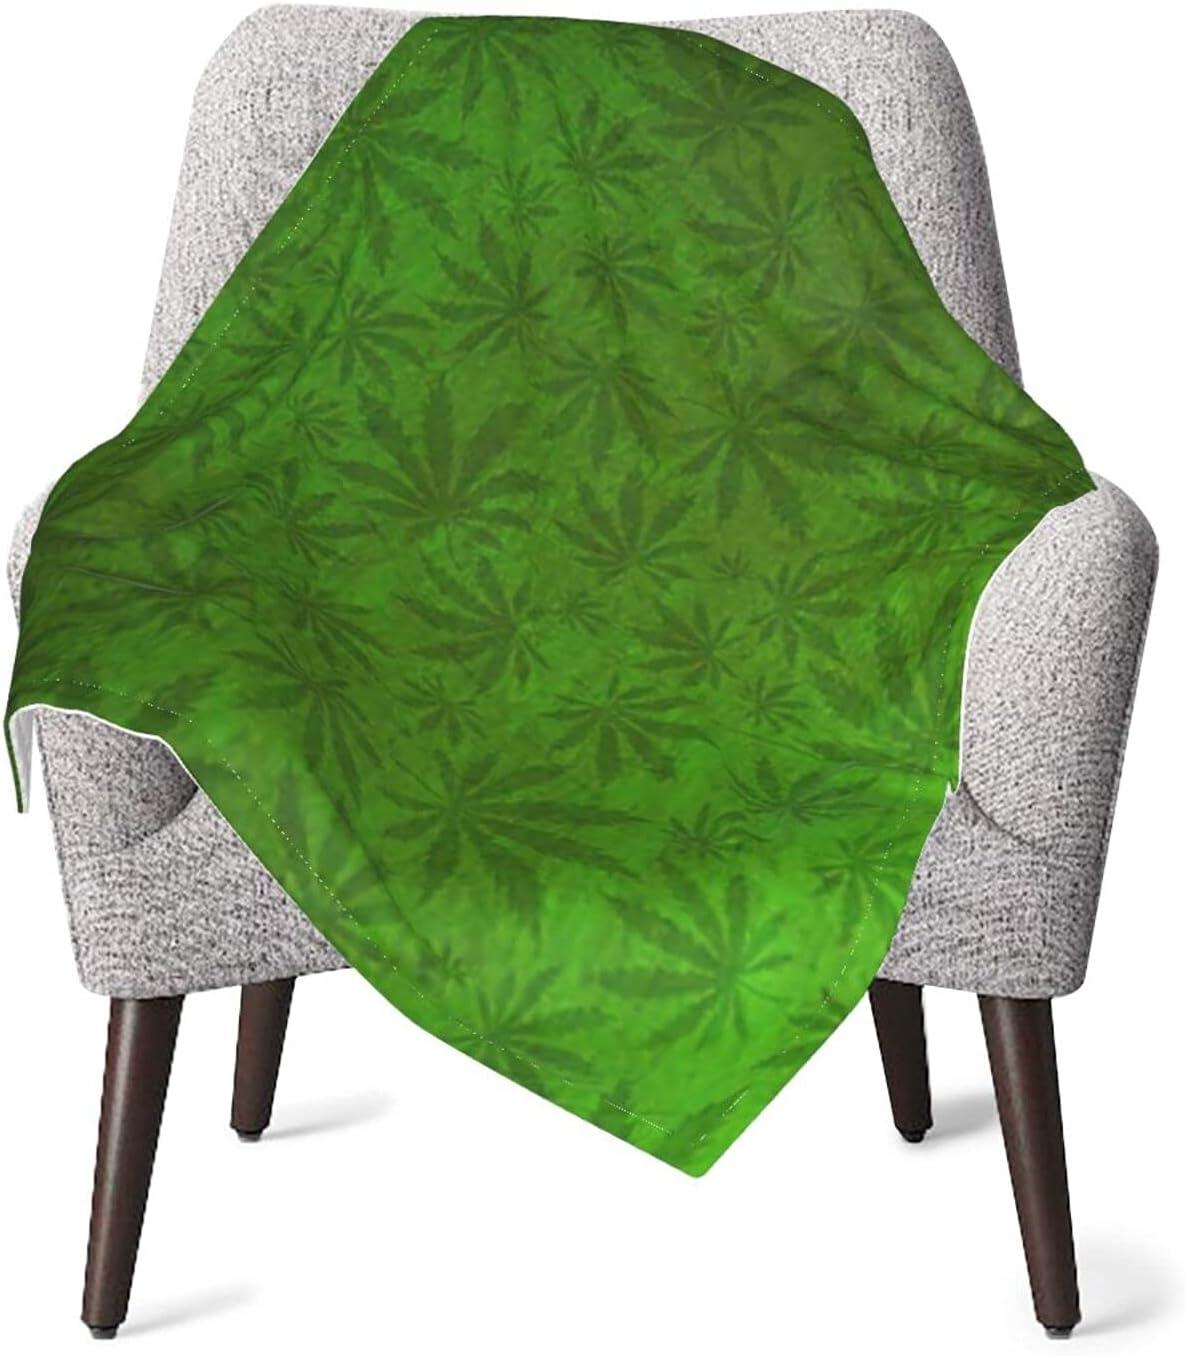 Warm Baby Blanket Max Louisville-Jefferson County Mall 61% OFF Weed Leaf Green Marijuana Grunge Plant Newborn